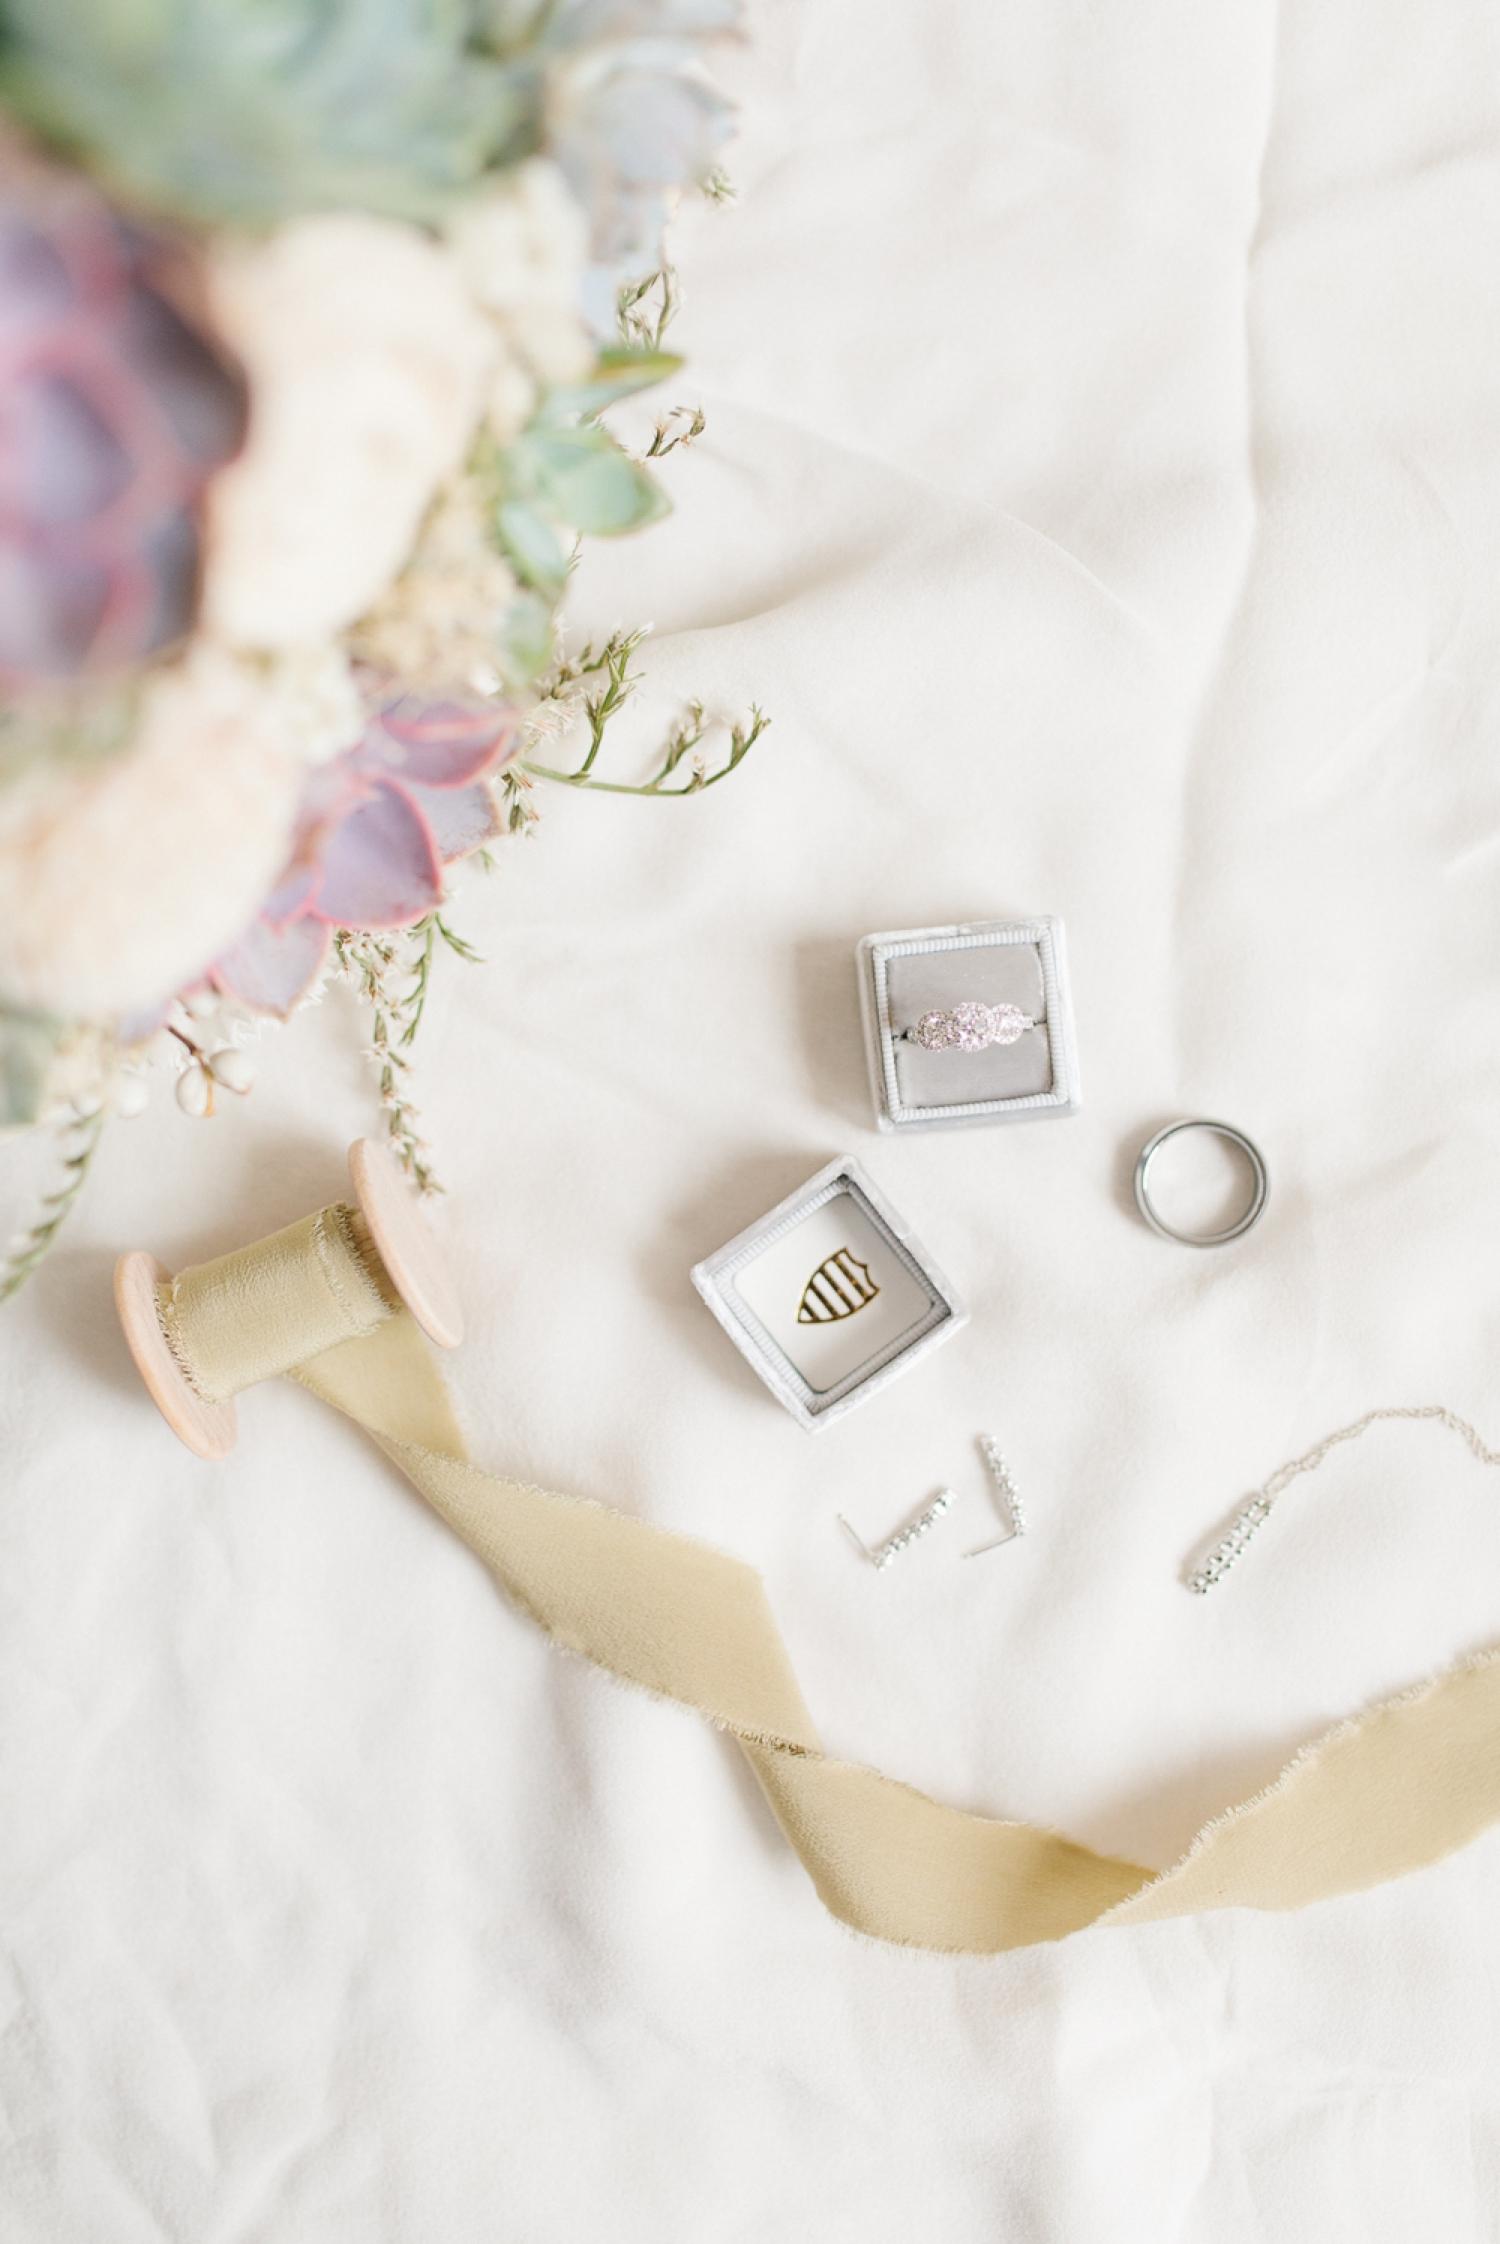 Centralia Square Grand Ballroom and Hotel Wedding | Succulent Wedding | Seattle Wedding Photographer | Hotel Wedding Pacific Northwest 12.jpg